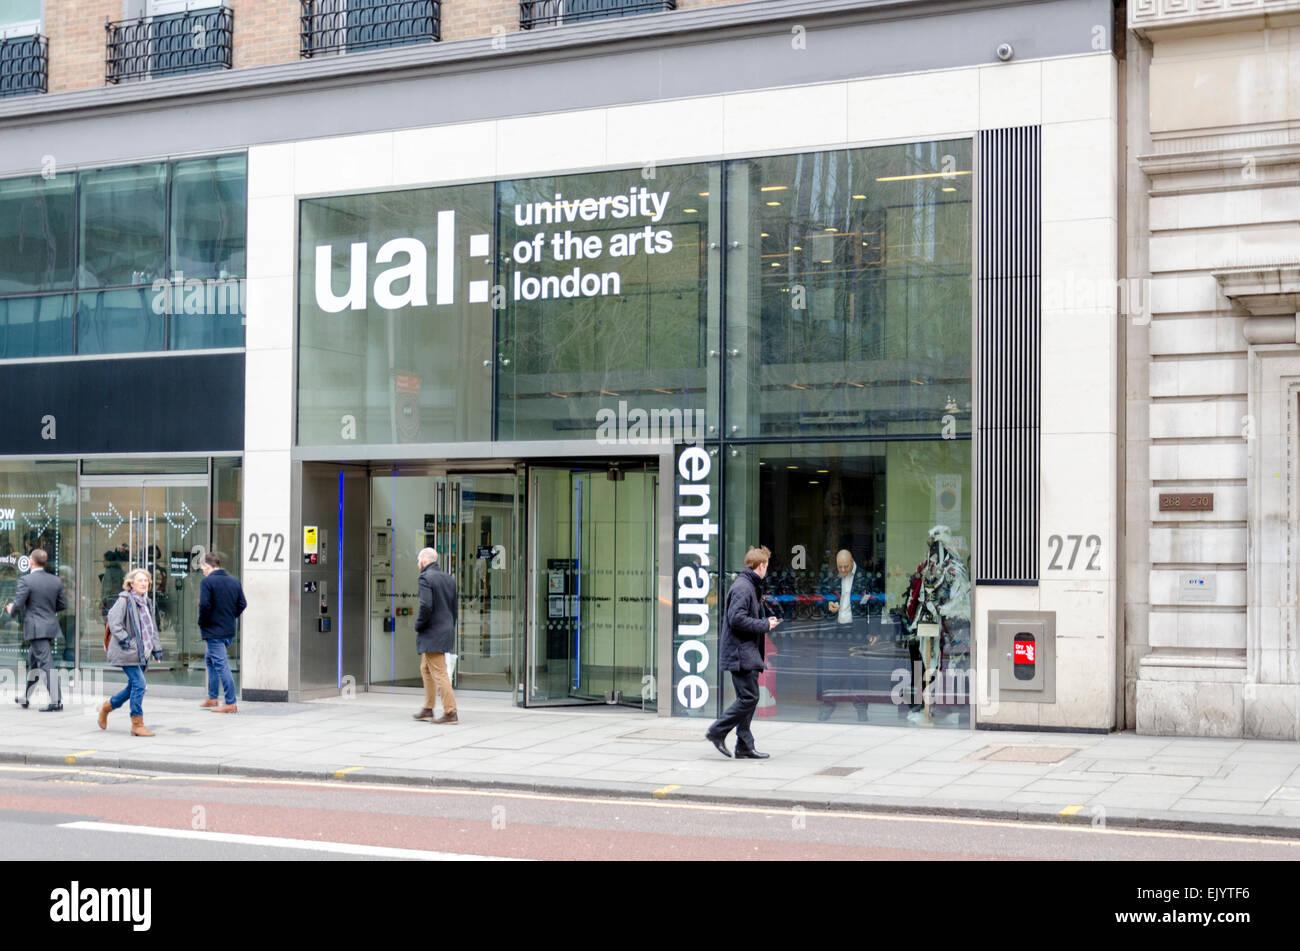 University of the Arts London (UAL), London, UK - Stock Image